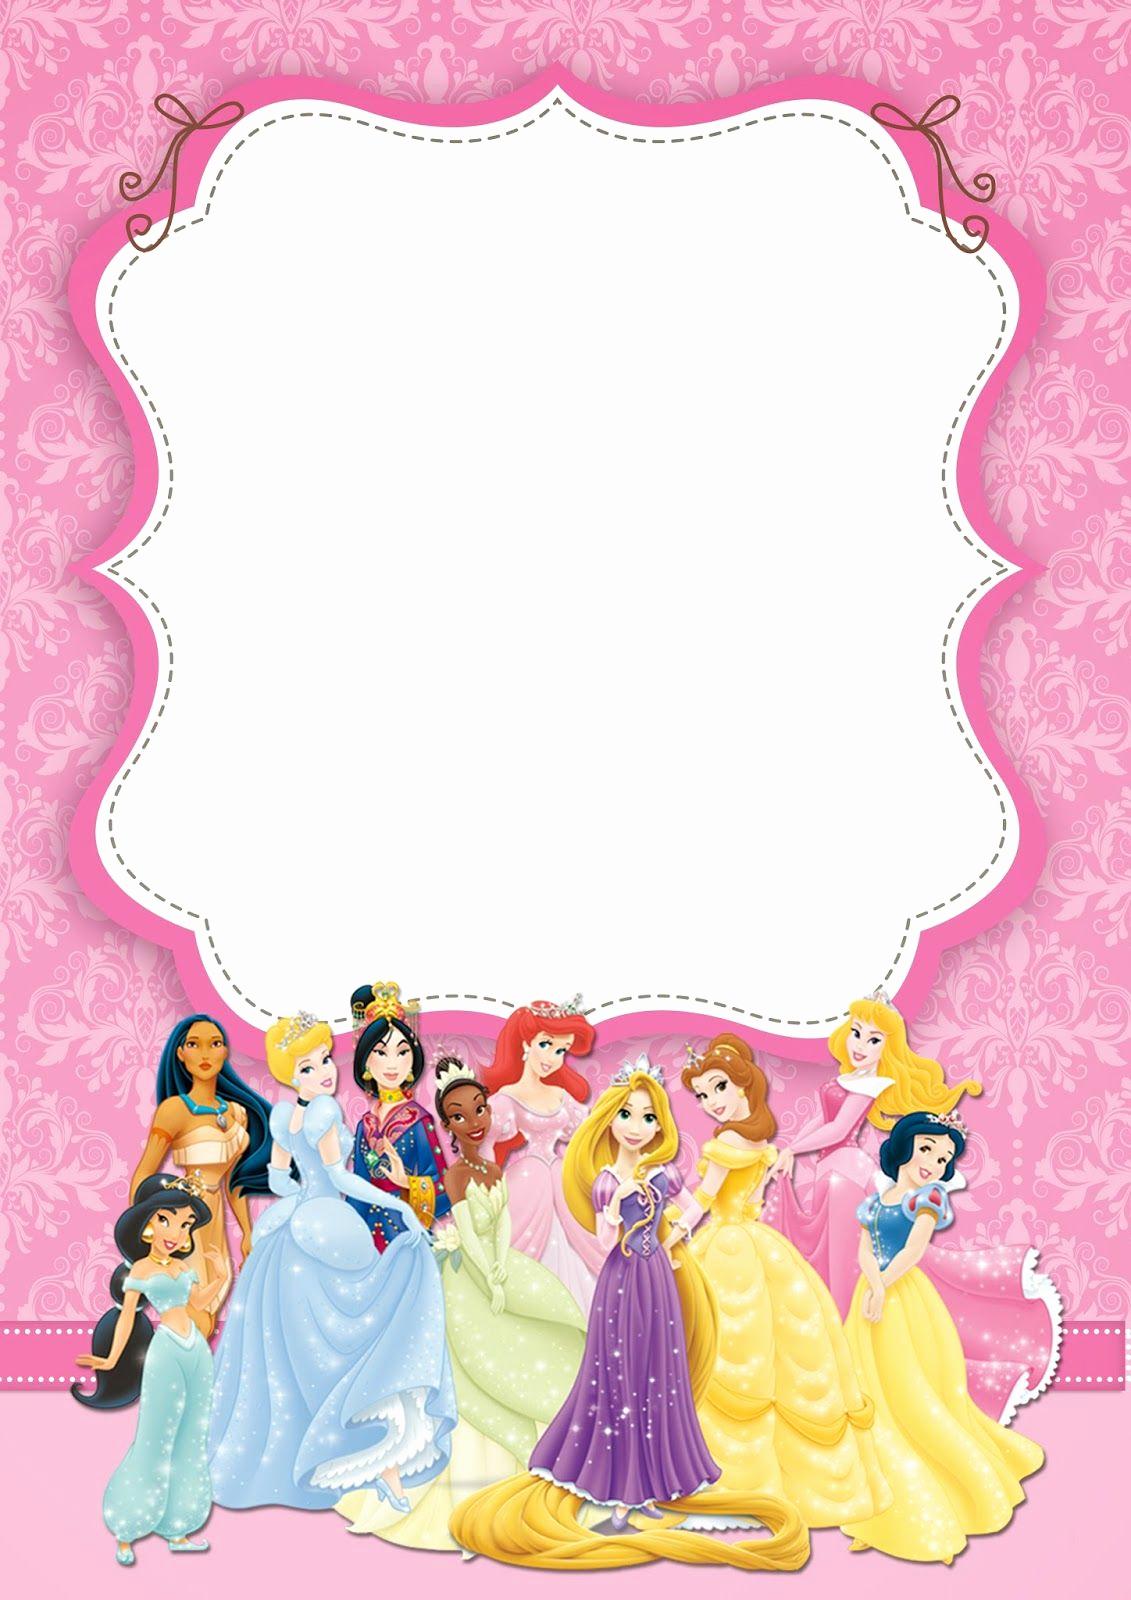 Free Princess Invitation Template Unique Free Printable Disney Princess Ticket Invitation